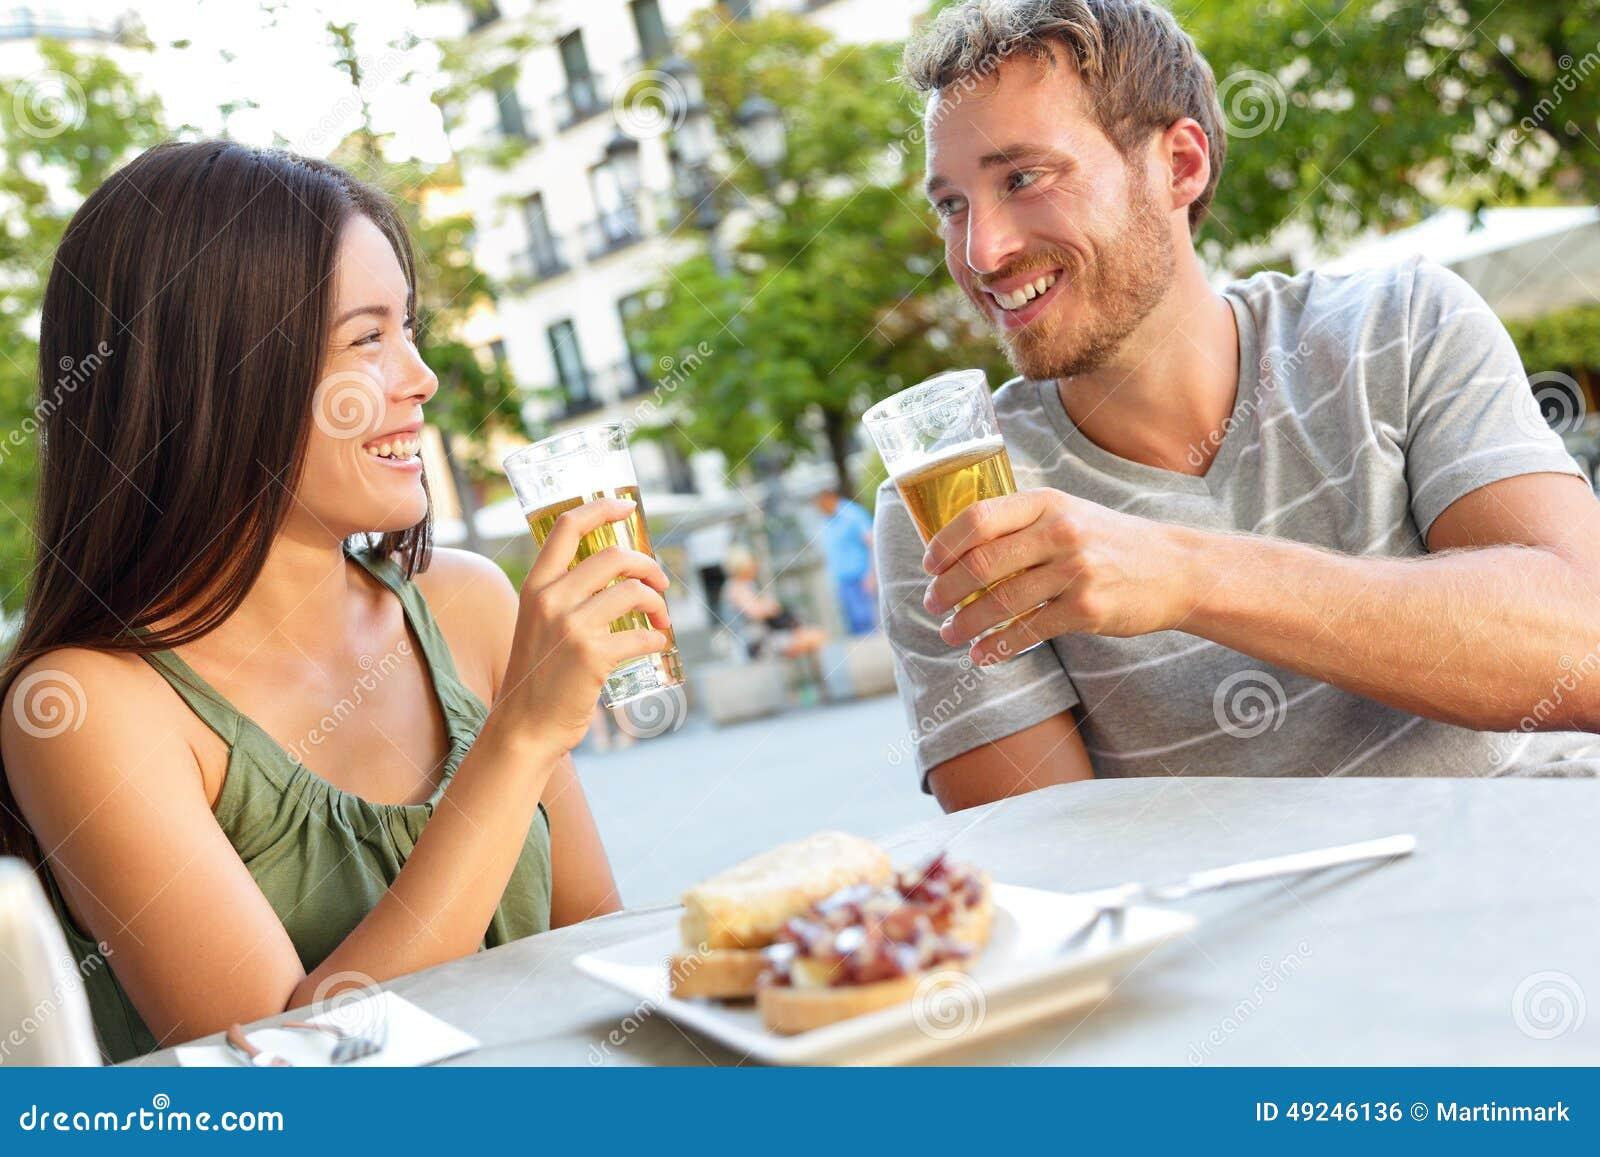 Vanity Dating Spanish Drinks Widowed